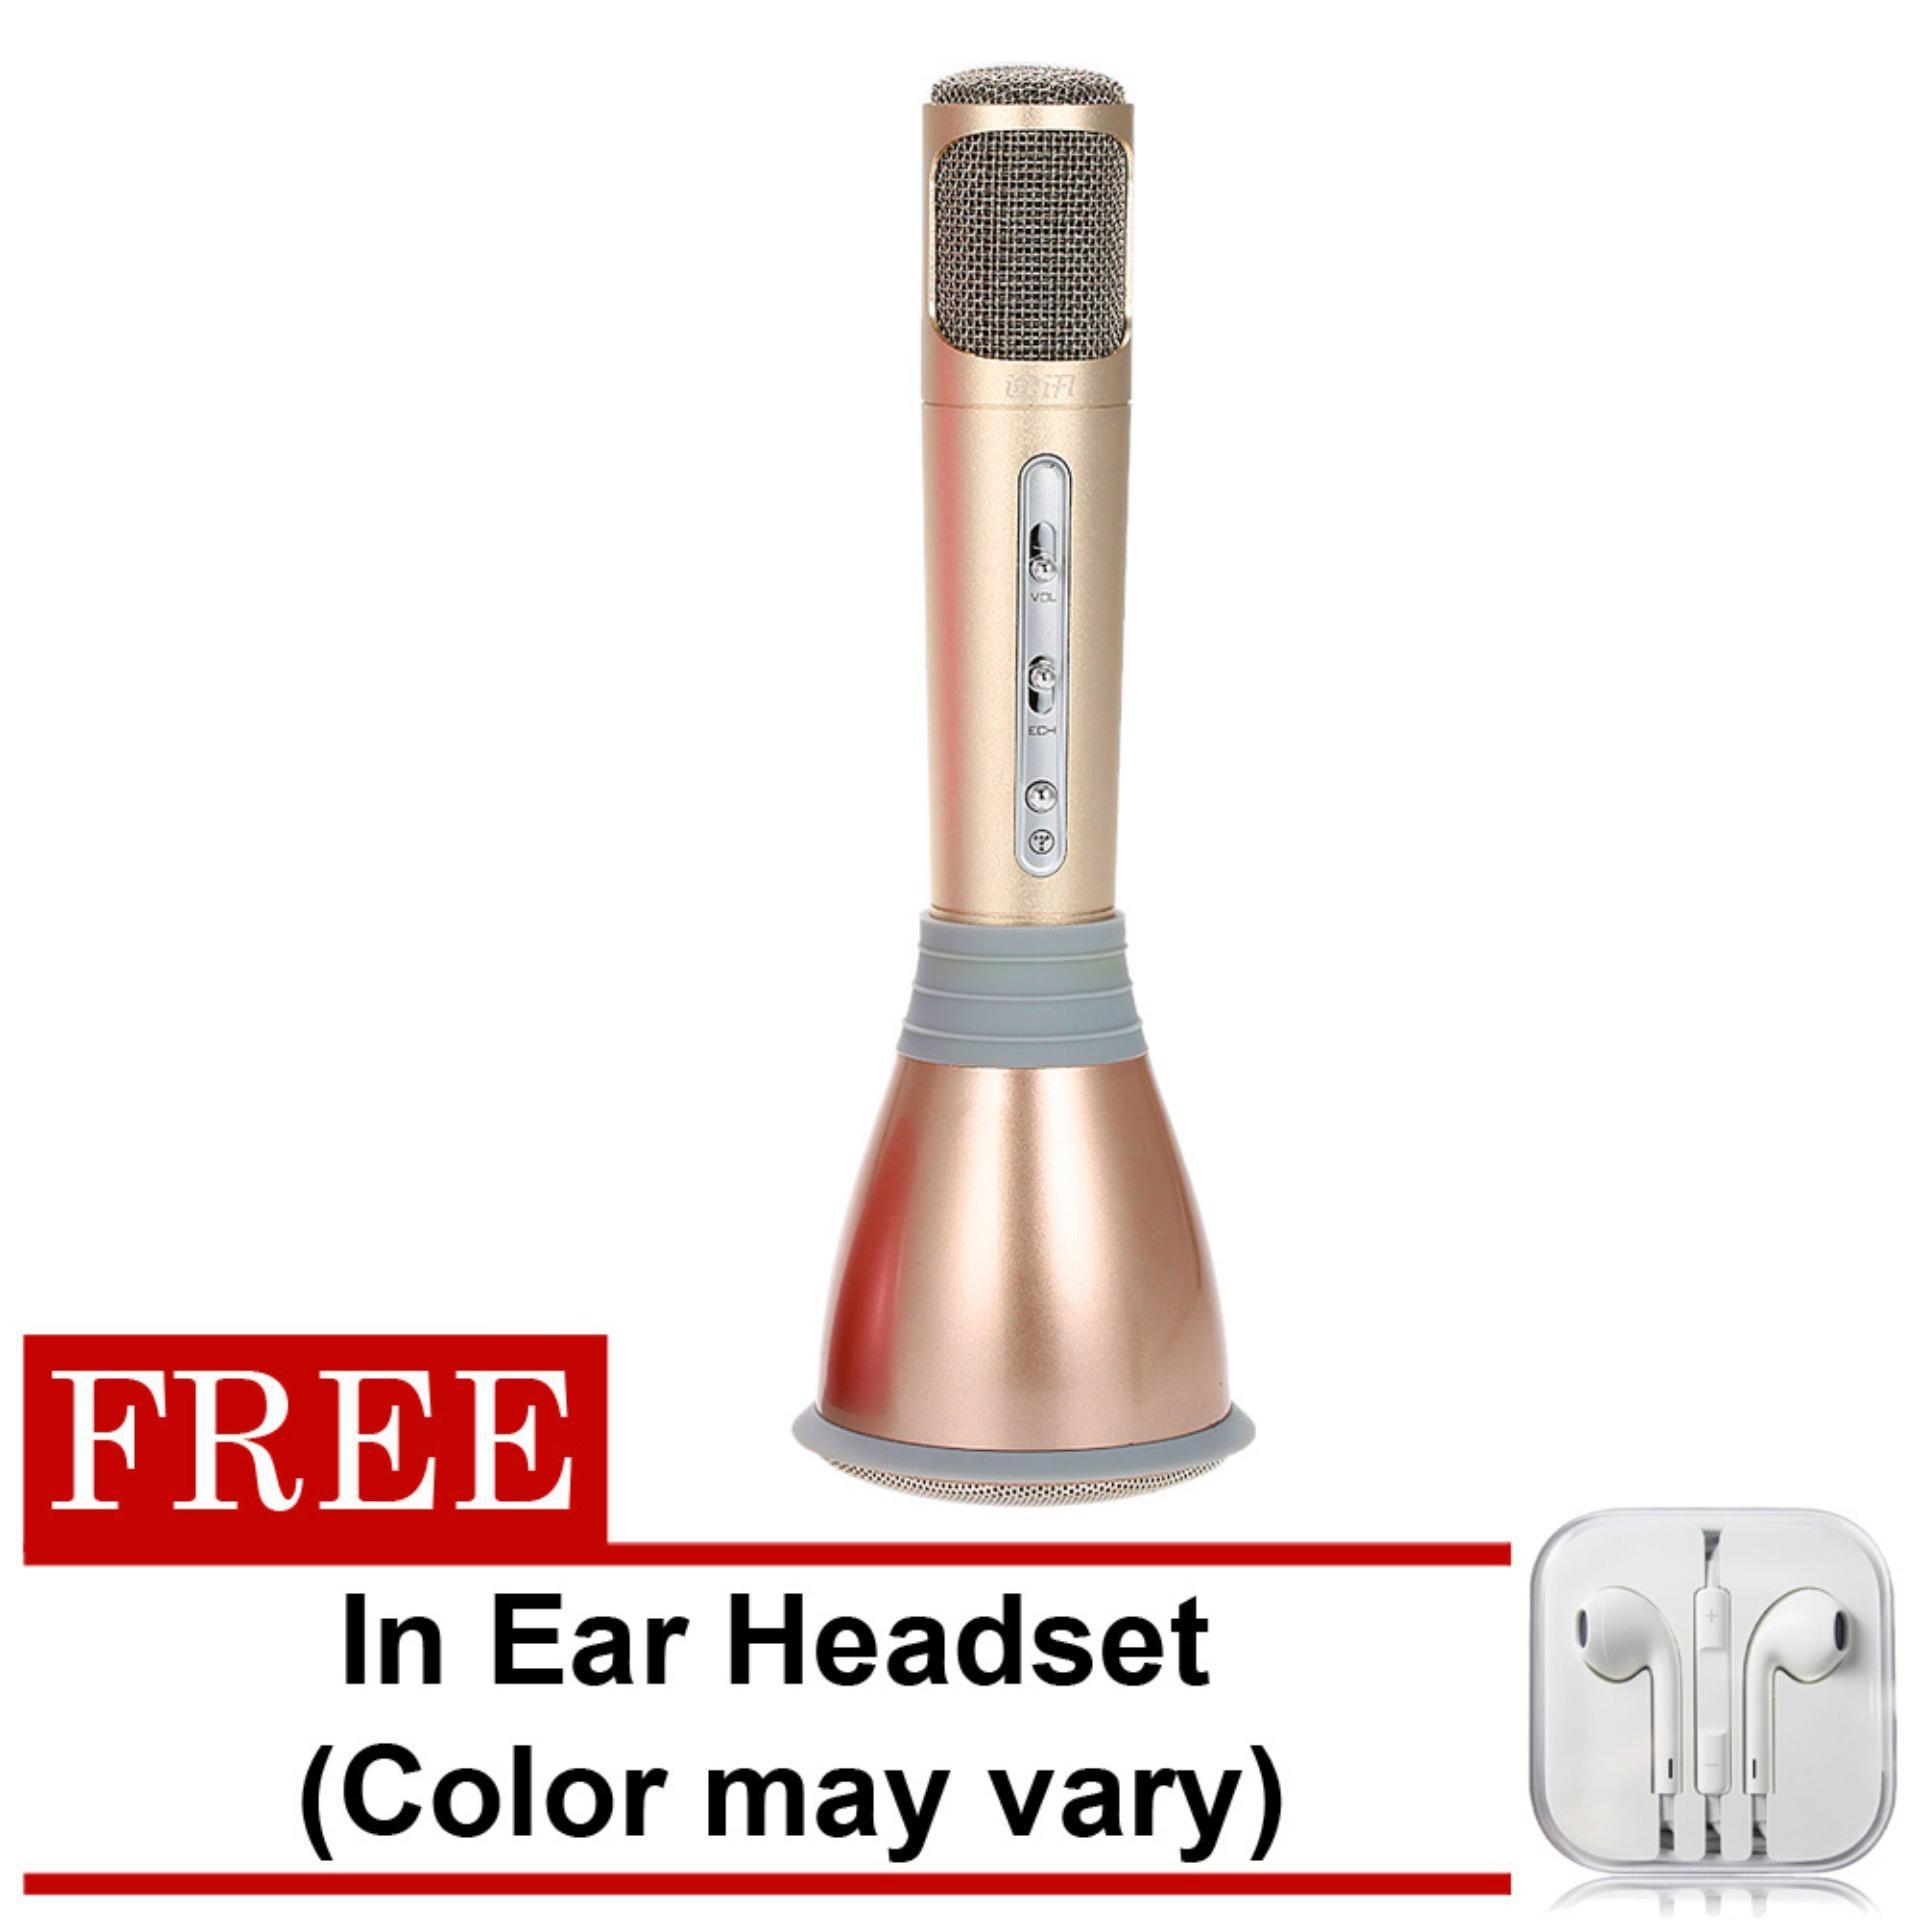 TUXUN K068 Handheld KTV Wireless Bluetooth Microphone Karaoke Player Perfect Design for Karaoke (Gold) with FREE ...